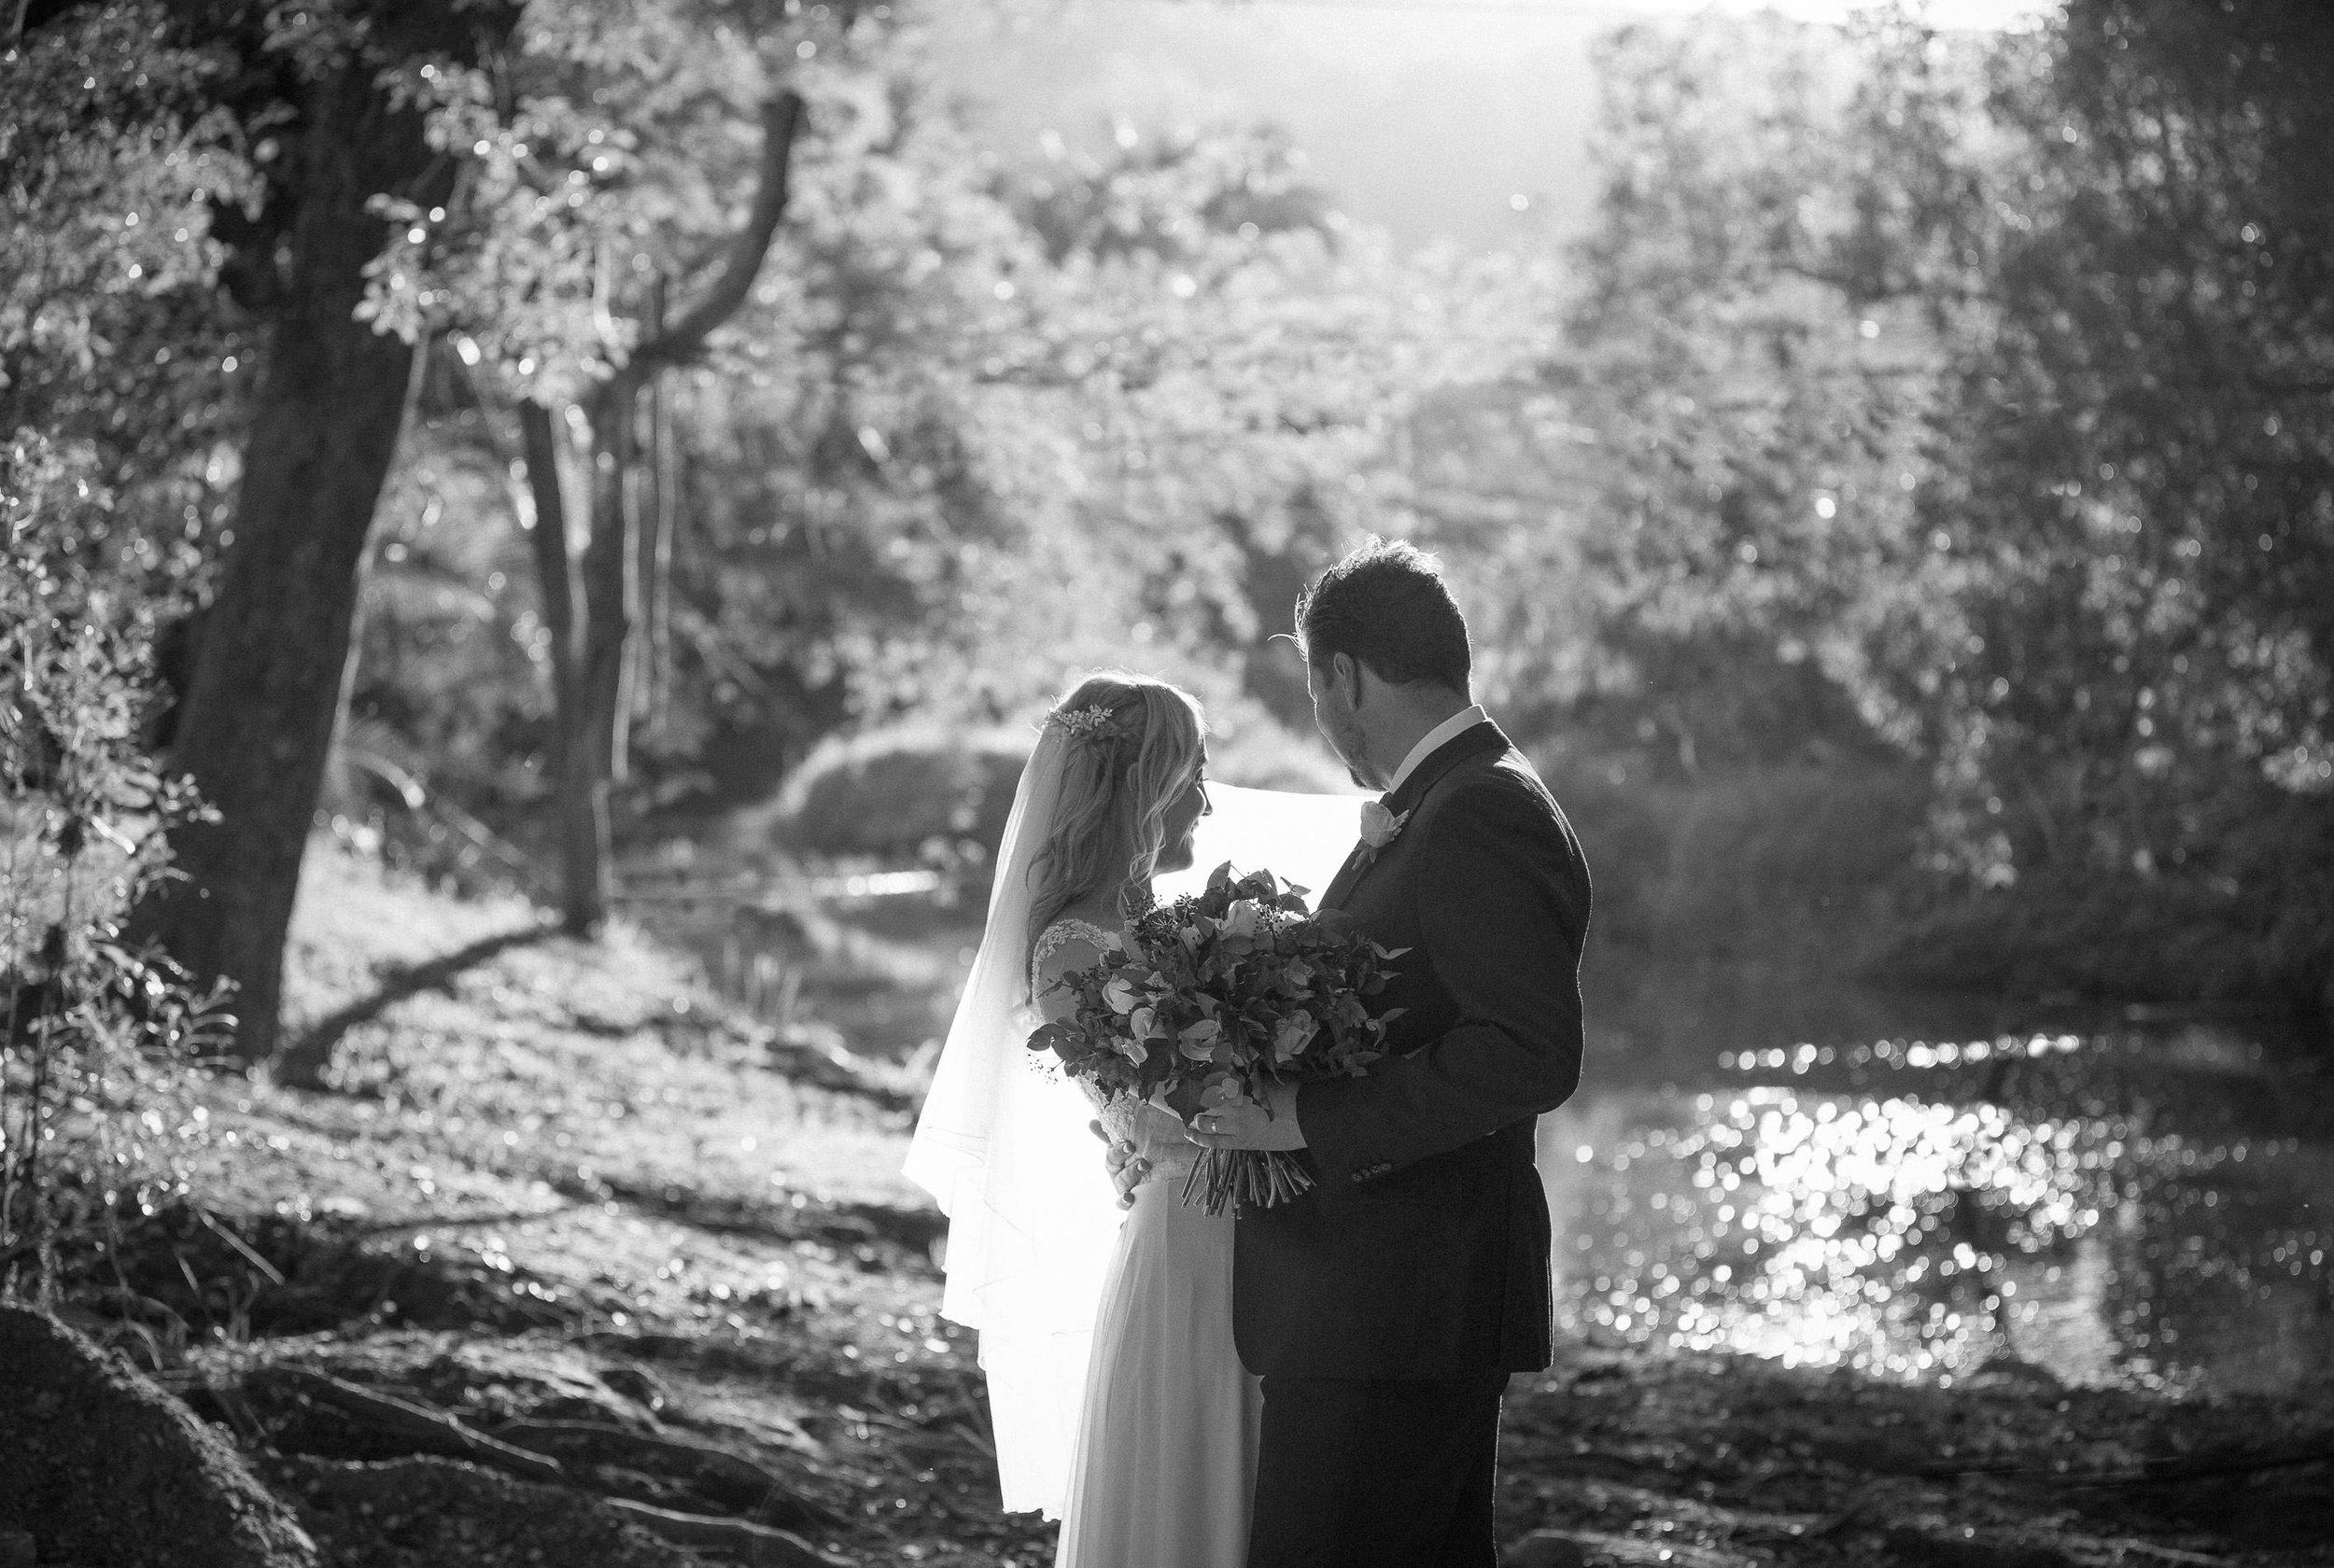 True North Photography_Boomerang Farm_Stacey and Isaac_Gold Coast Wedding_Barm Wedding_Hinterland Wedding-135.jpg